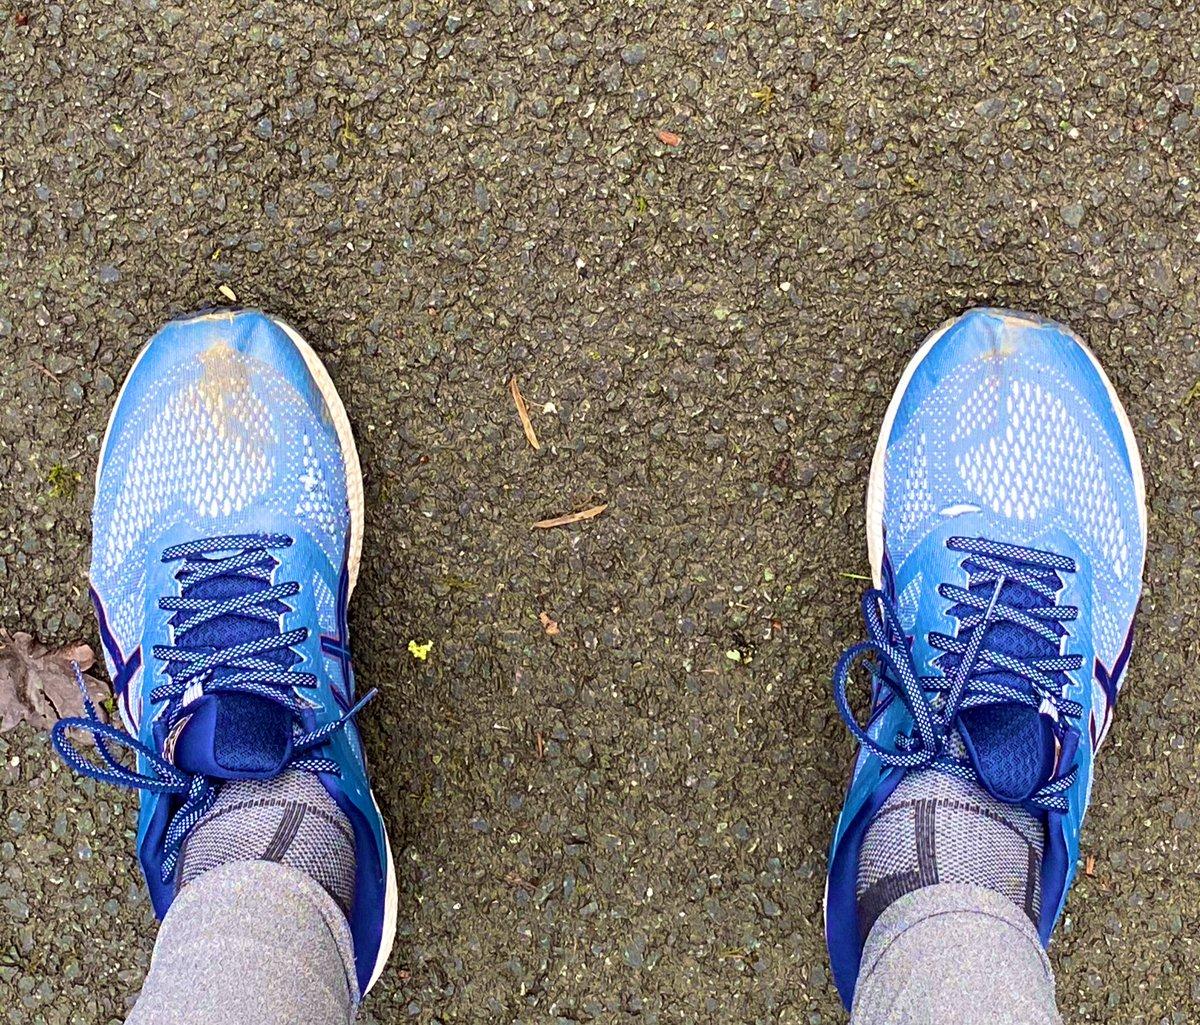 Day 1️⃣7️⃣ EAT CLEAN TRAIN DIRTY - Ran 15km today to make it 30km for this weekend 🏃🏽♂️ @REDJanuaryUK  getting my mojo back 👊🏽@UKRunChat @runr_uk   #running #fitness #REDJanuary2021 #runningmotivation #weekendvibes #PositiveVibes #mindovermatter #nevergiveup #runr #ukrunchat